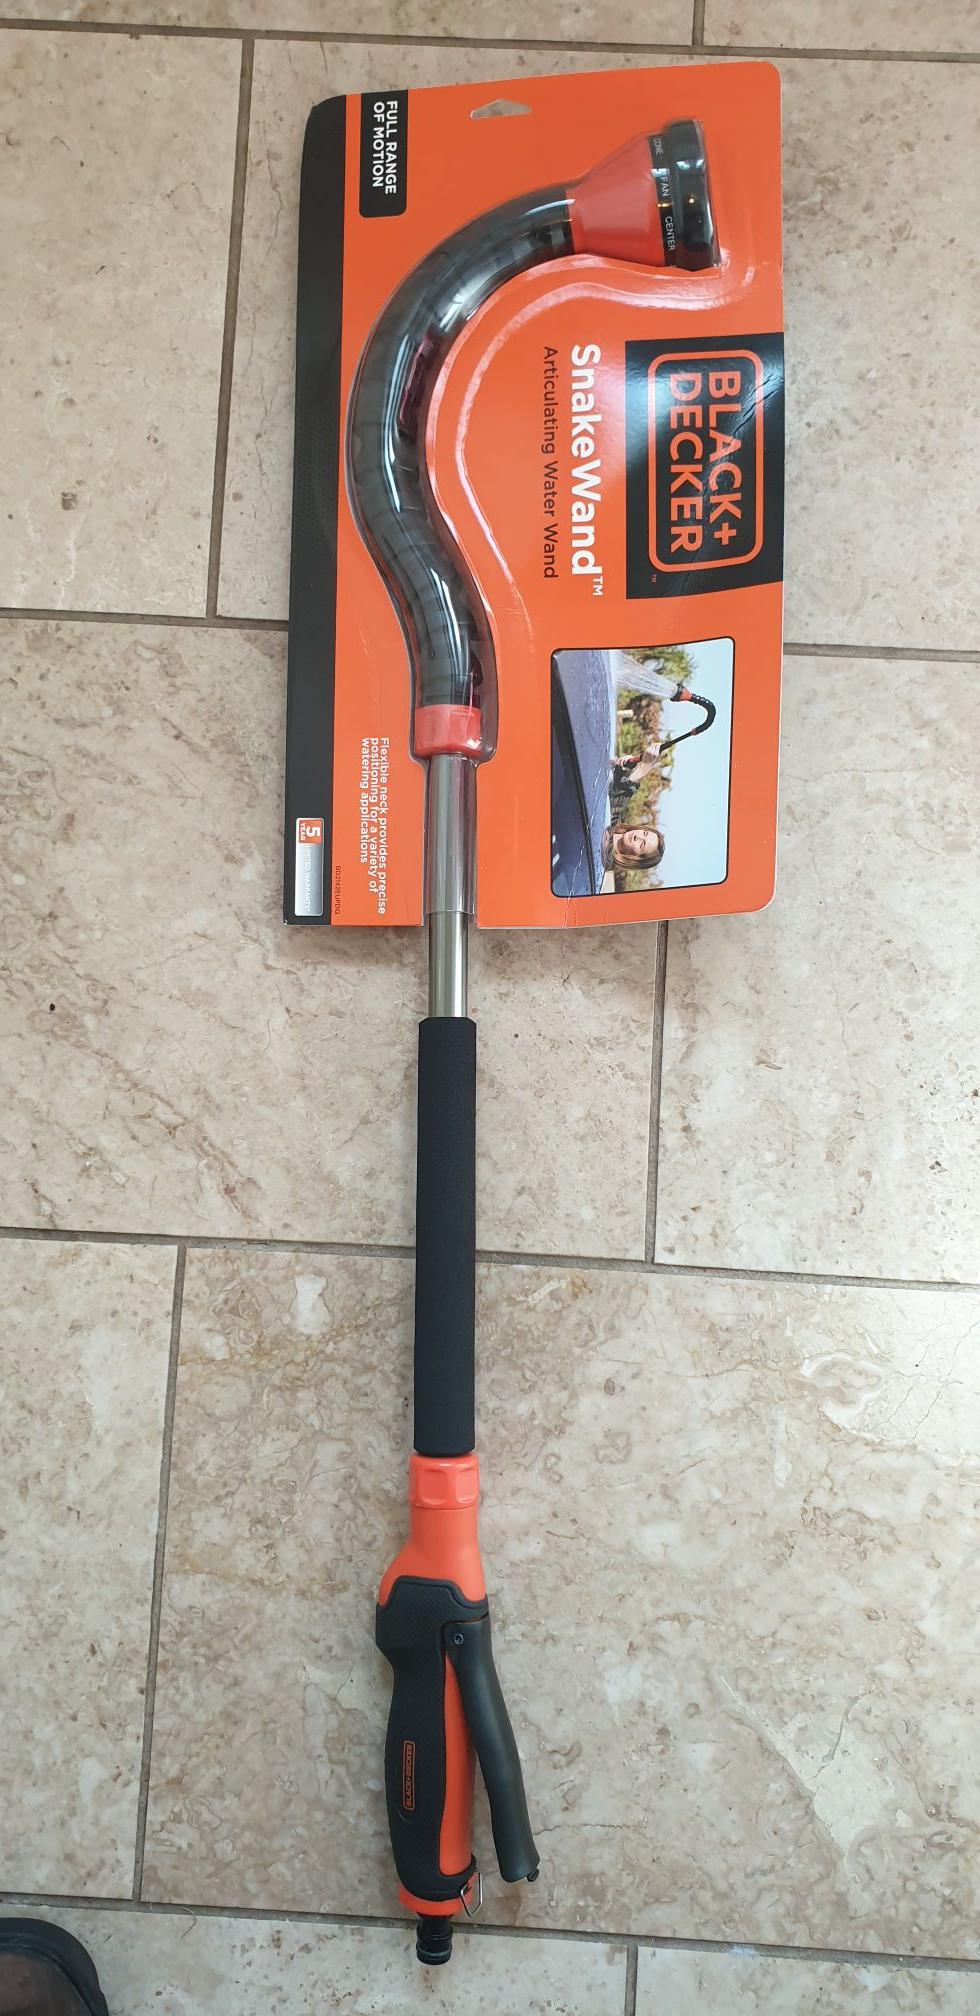 Black and decker articulated snake wand hose adapter £3.50 instore @ Homebase Sittingbourne